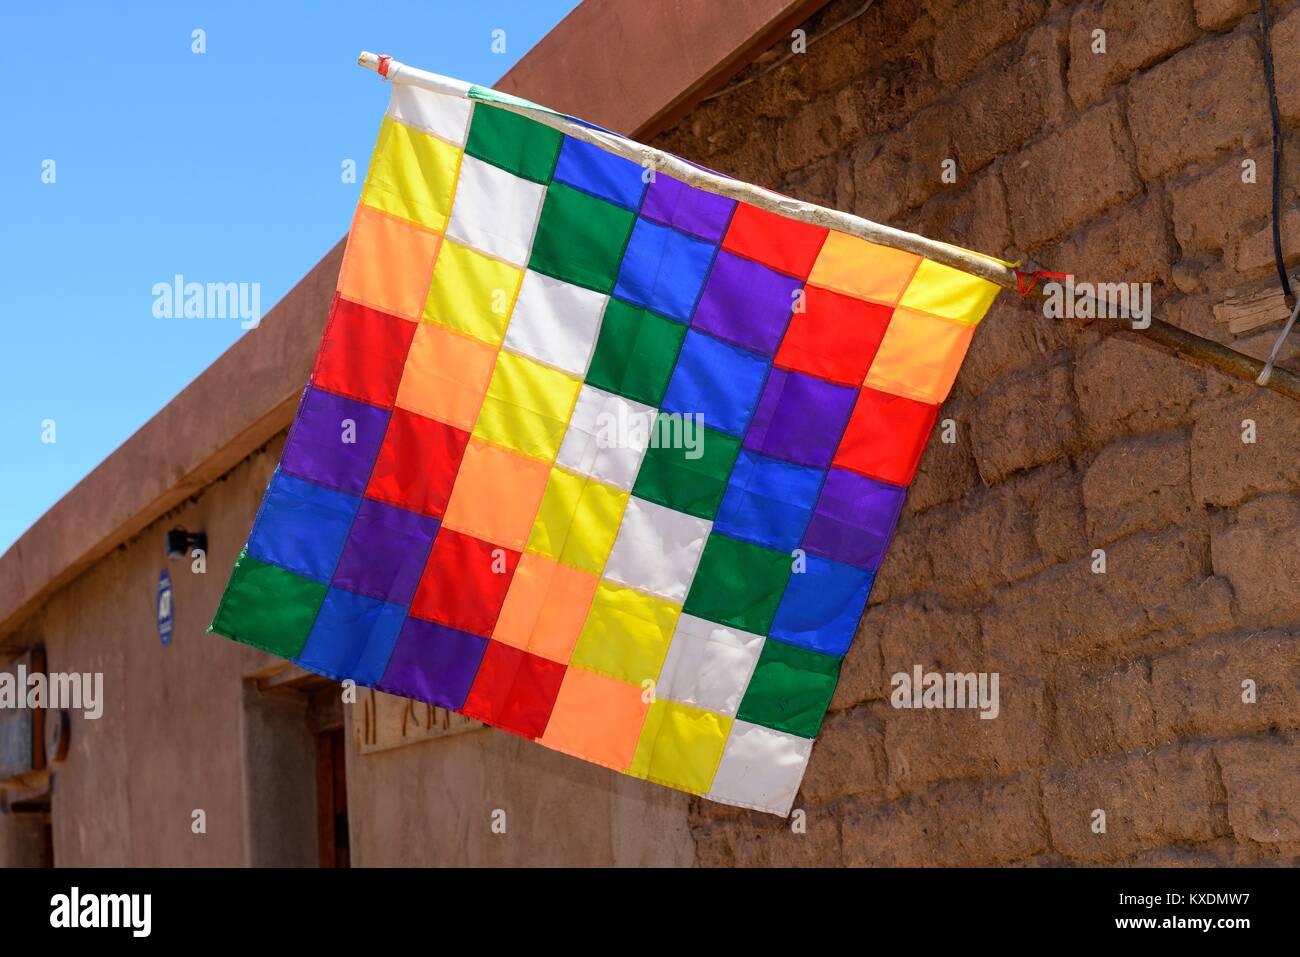 Whipala flag, symbol of the indigenous people, San Pedro de Atacama, El Loa, Antofagasta, Chile - Stock Image